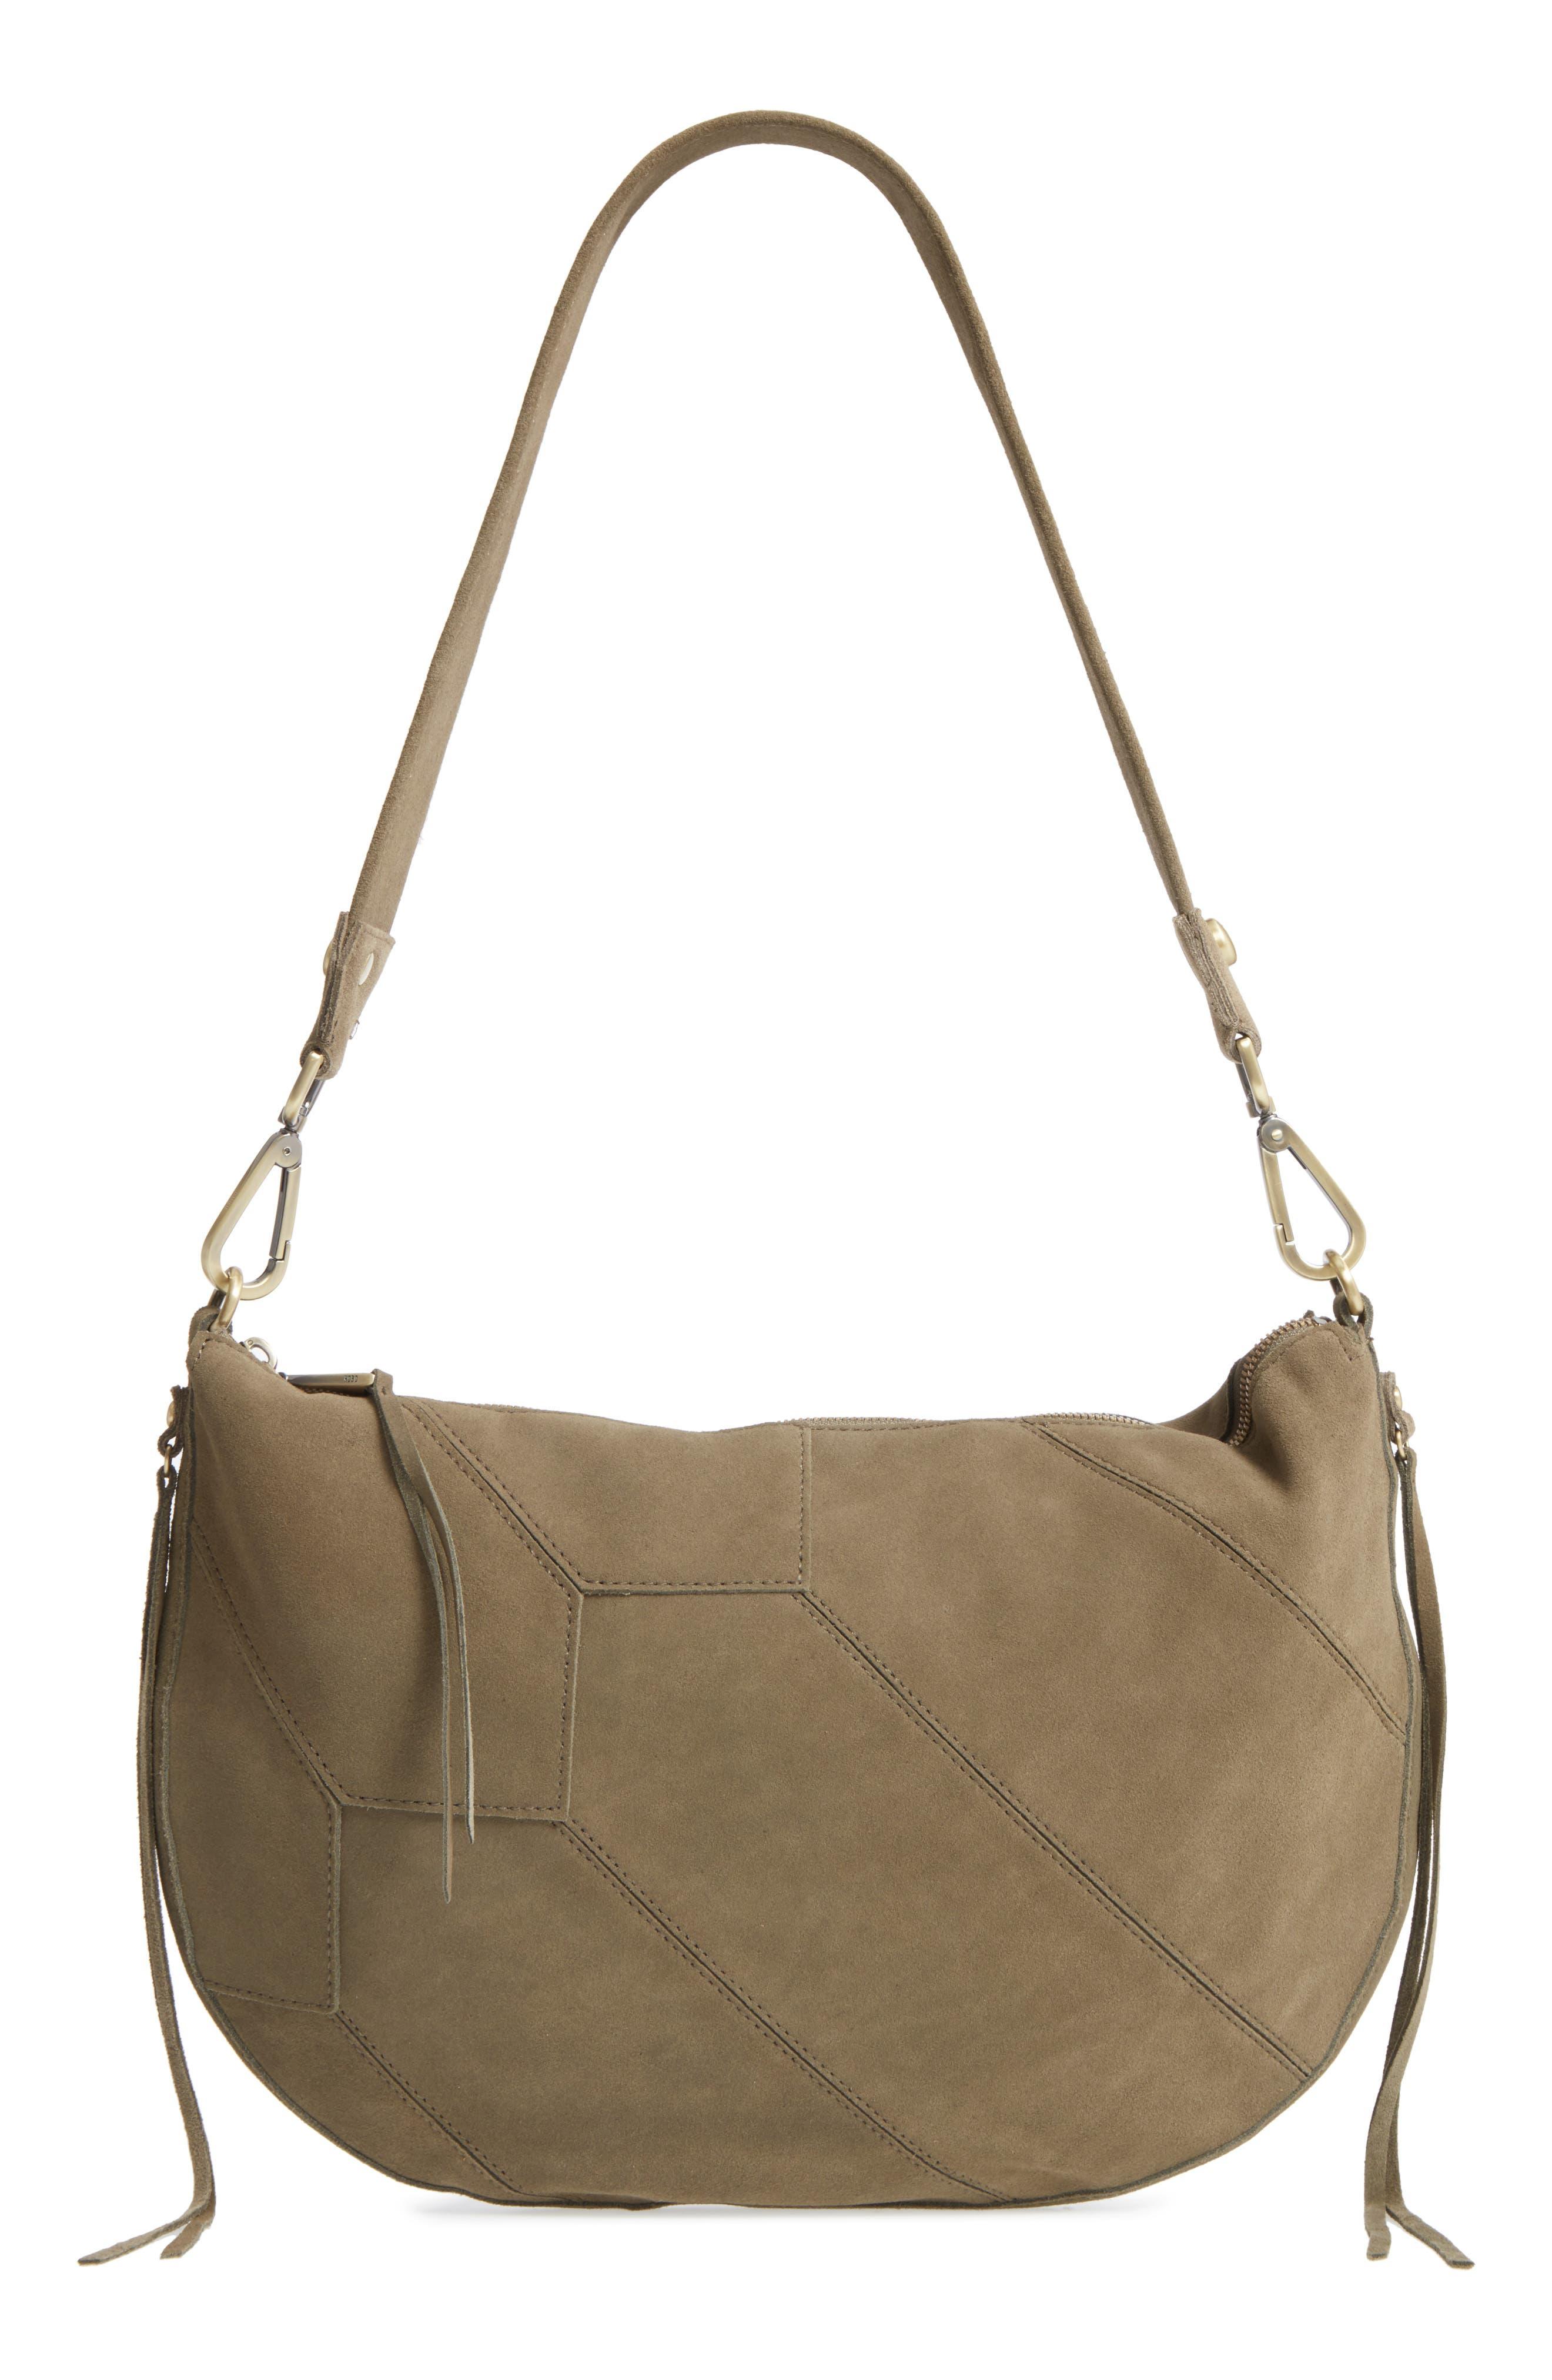 Main Image - Hobo Cisco Leather Hobo Bag